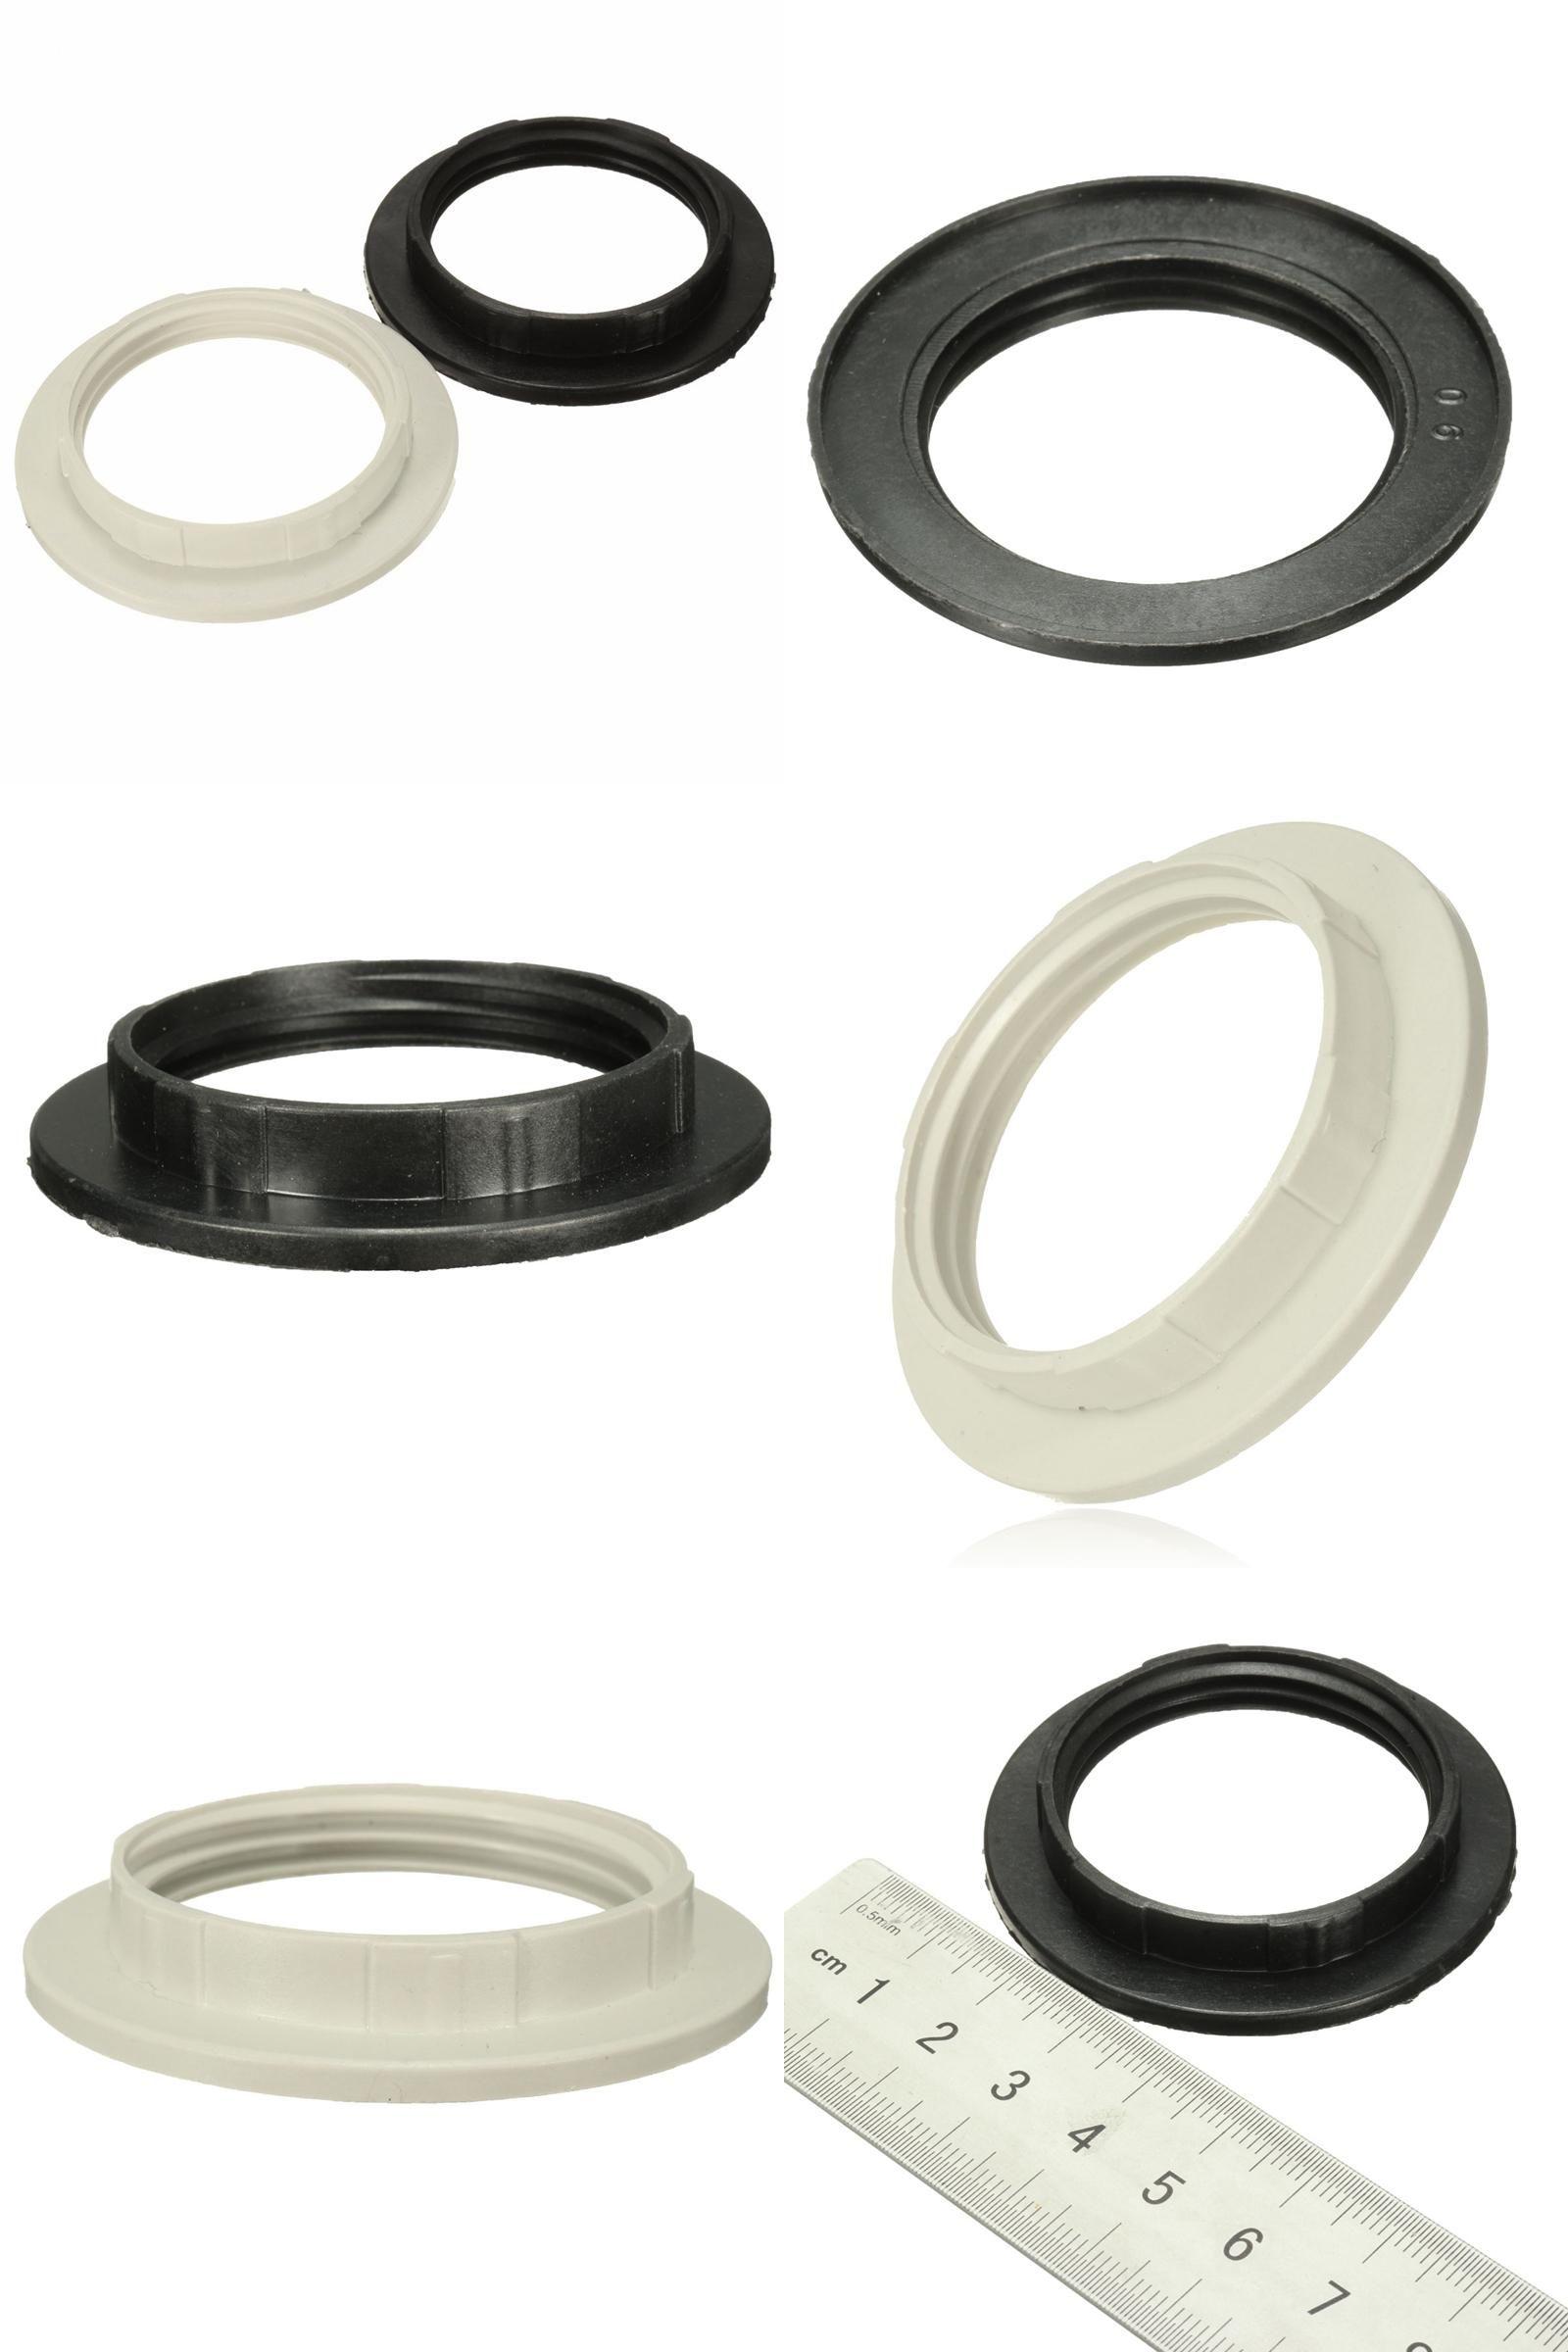 Visit to buy blackwhite e27 lampshade light shade collar ring visit to buy blackwhite e27 lampshade light shade collar ring adaptor 40mm arubaitofo Images